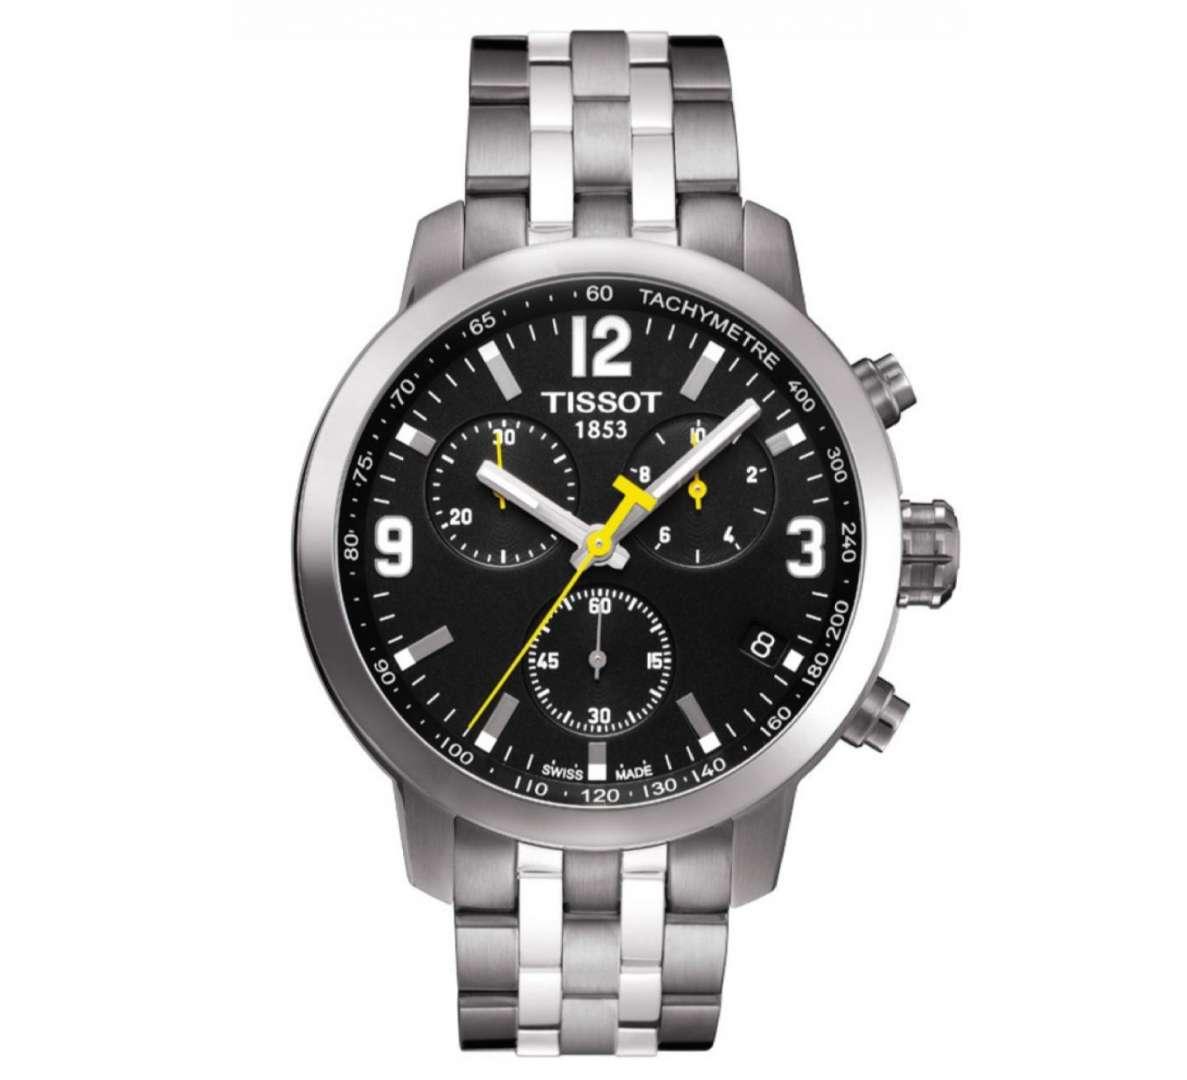 שעון יד אנלוגי tissot t055.417.11.057.00 טיסו